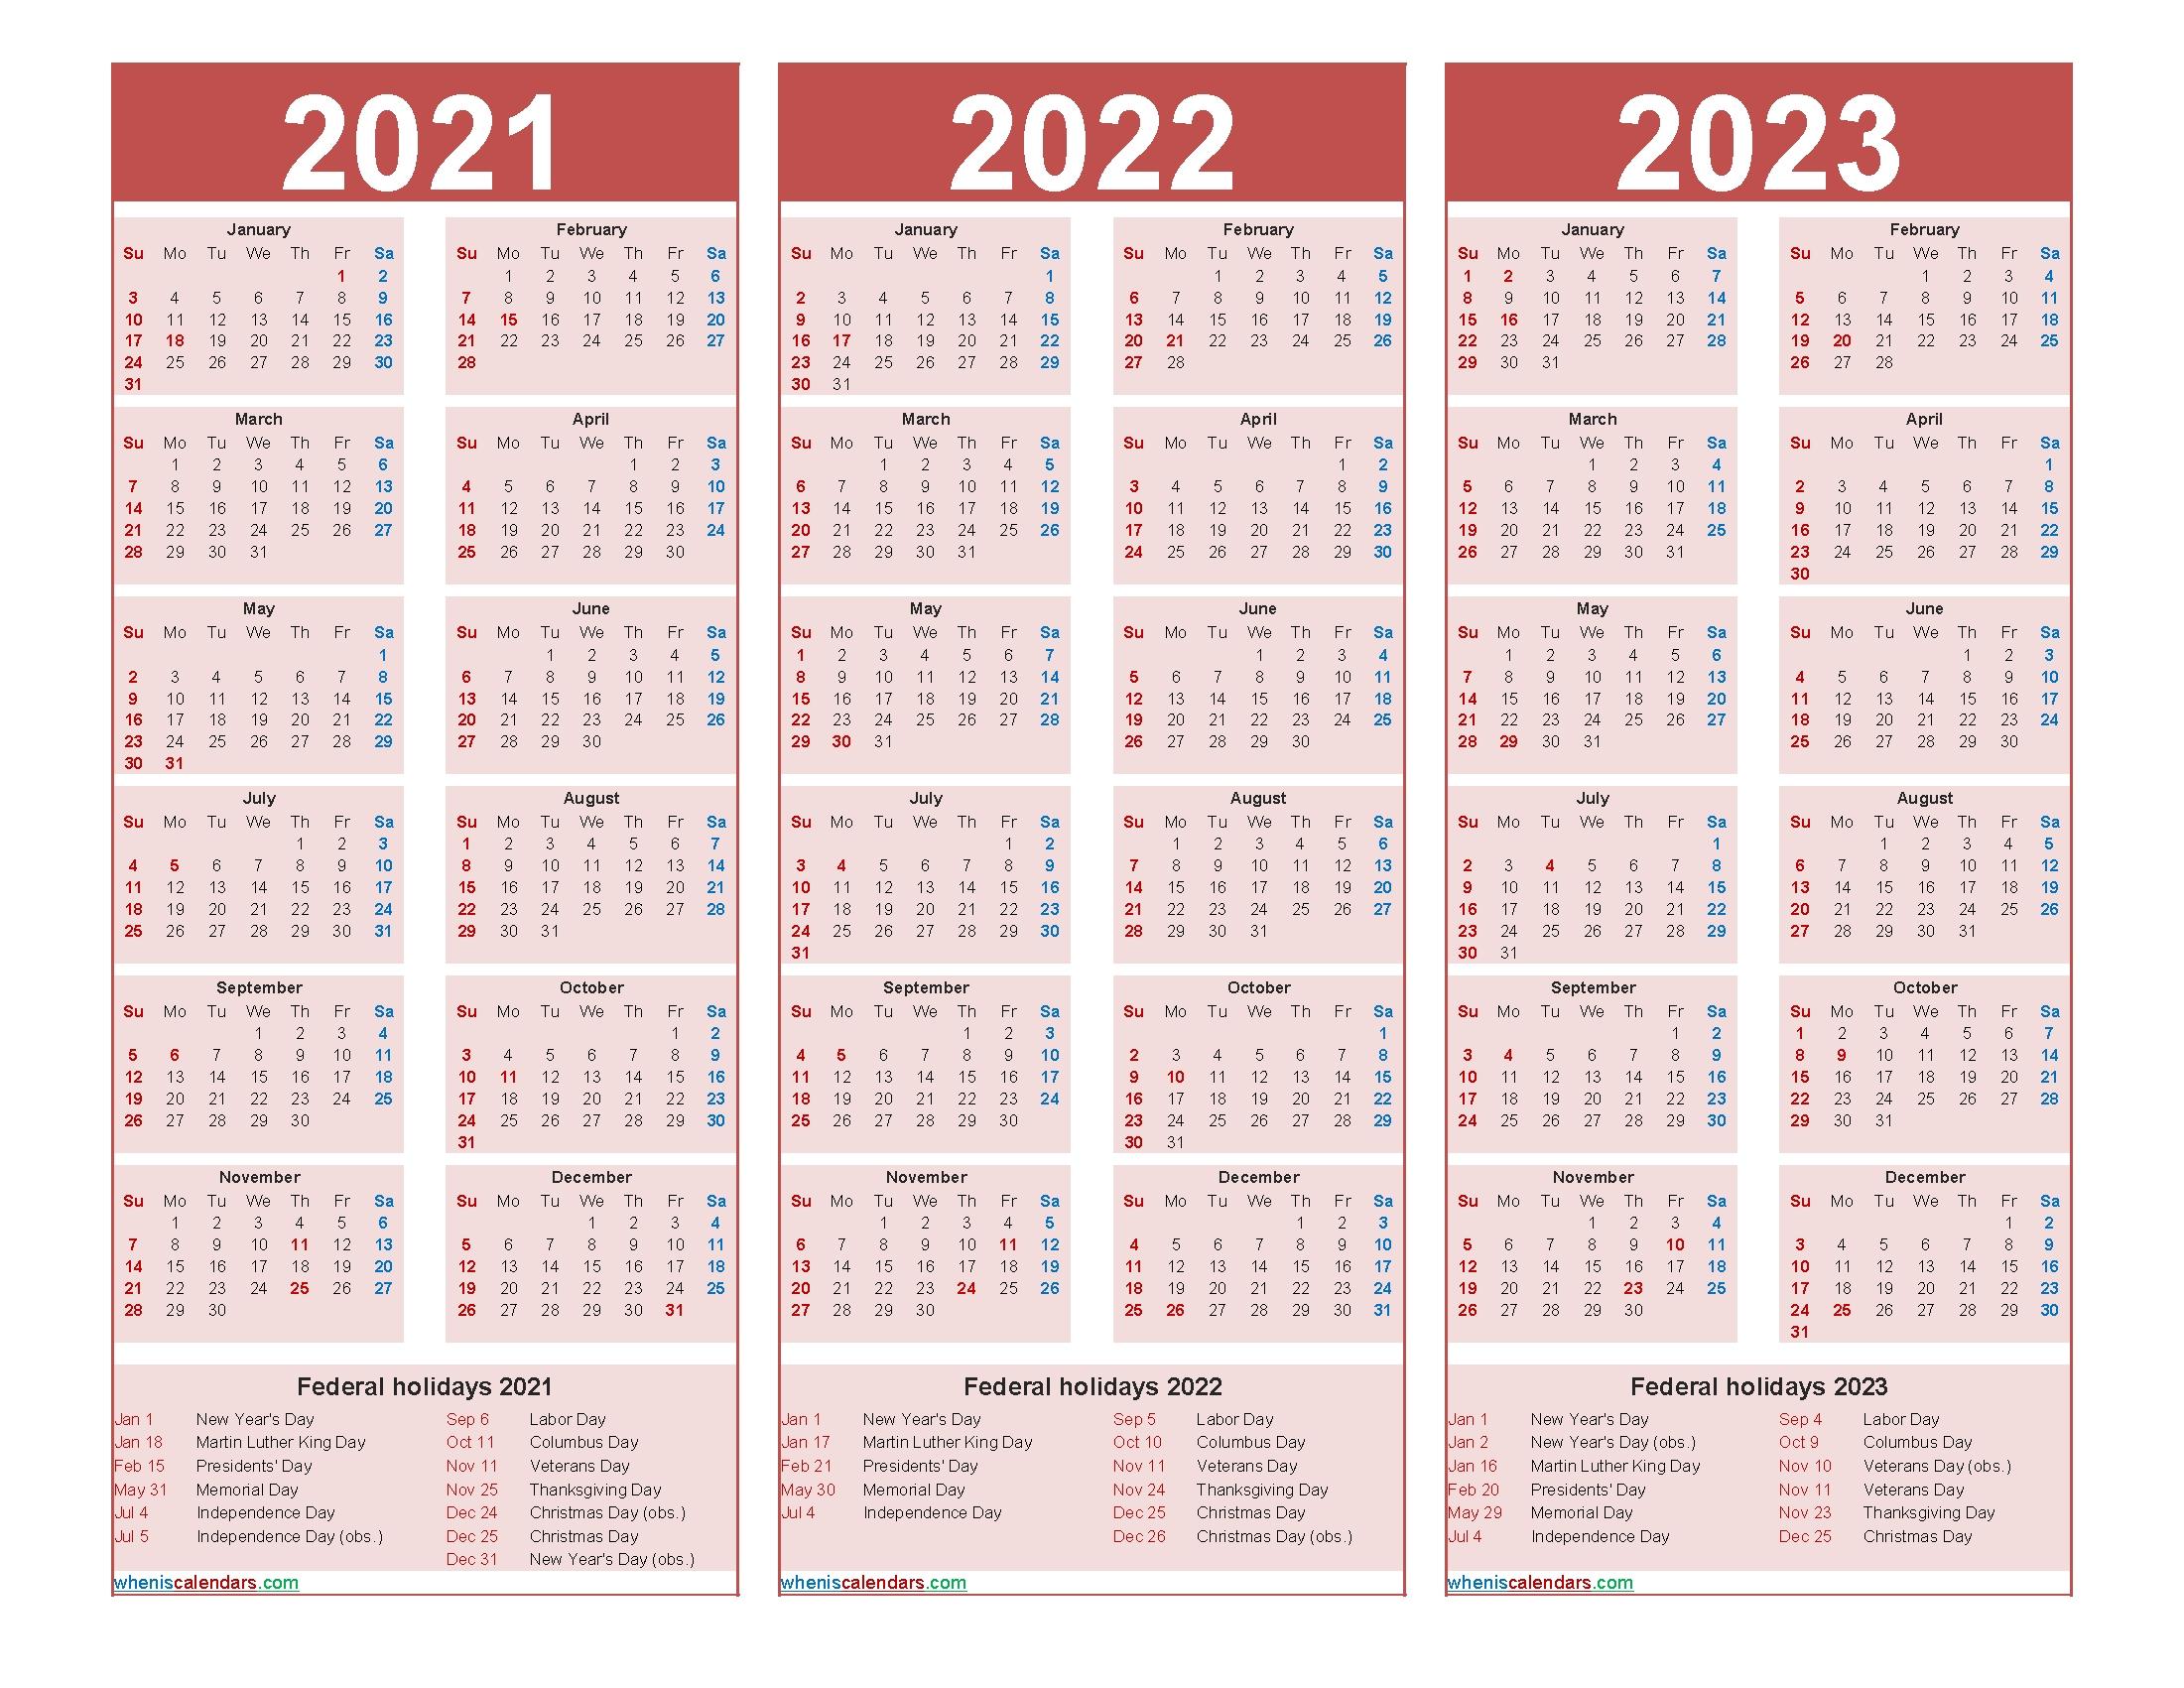 Free Printable 2021 To 2023 Calendar With Holidays - Free Printable 2020 Monthly Calendar With